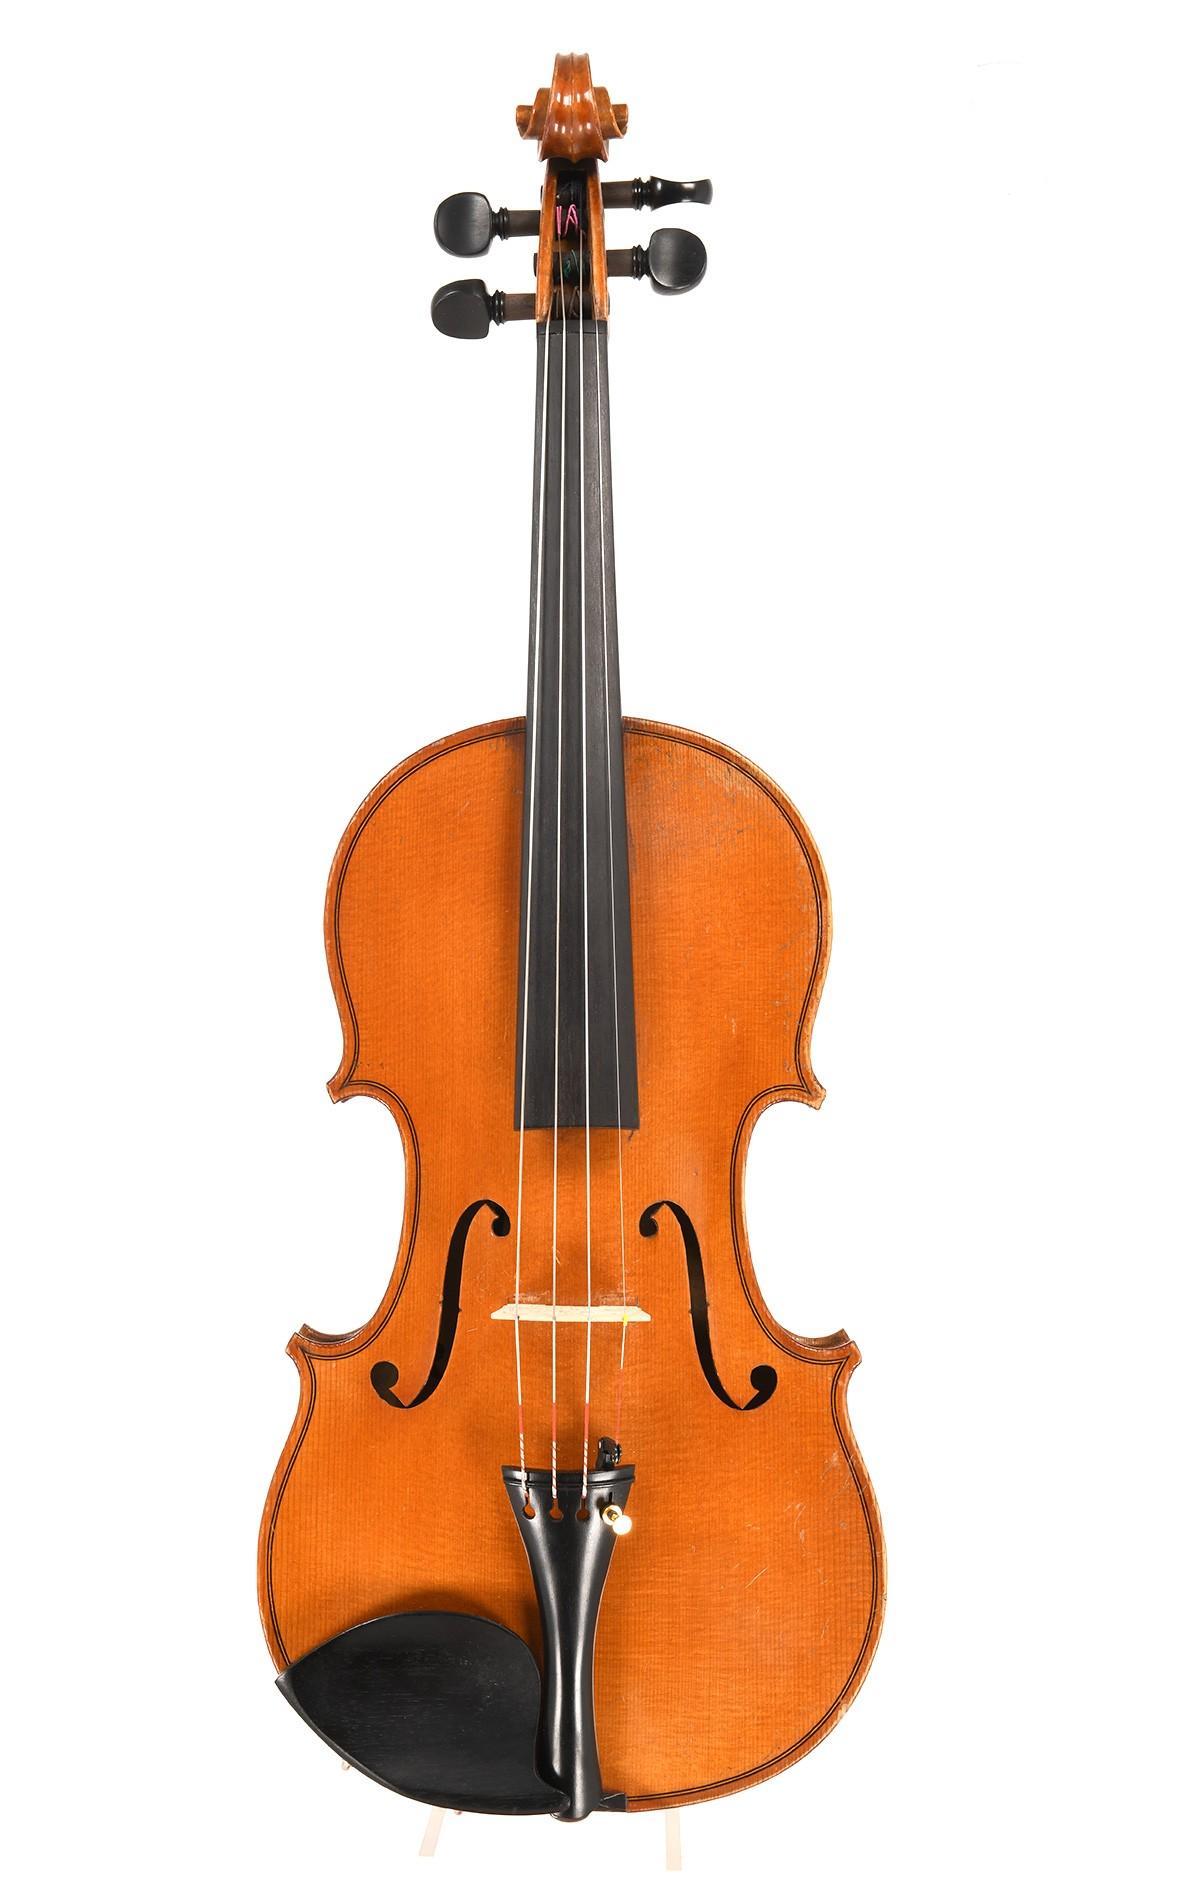 Old Mirecourt violin, made circa 1920